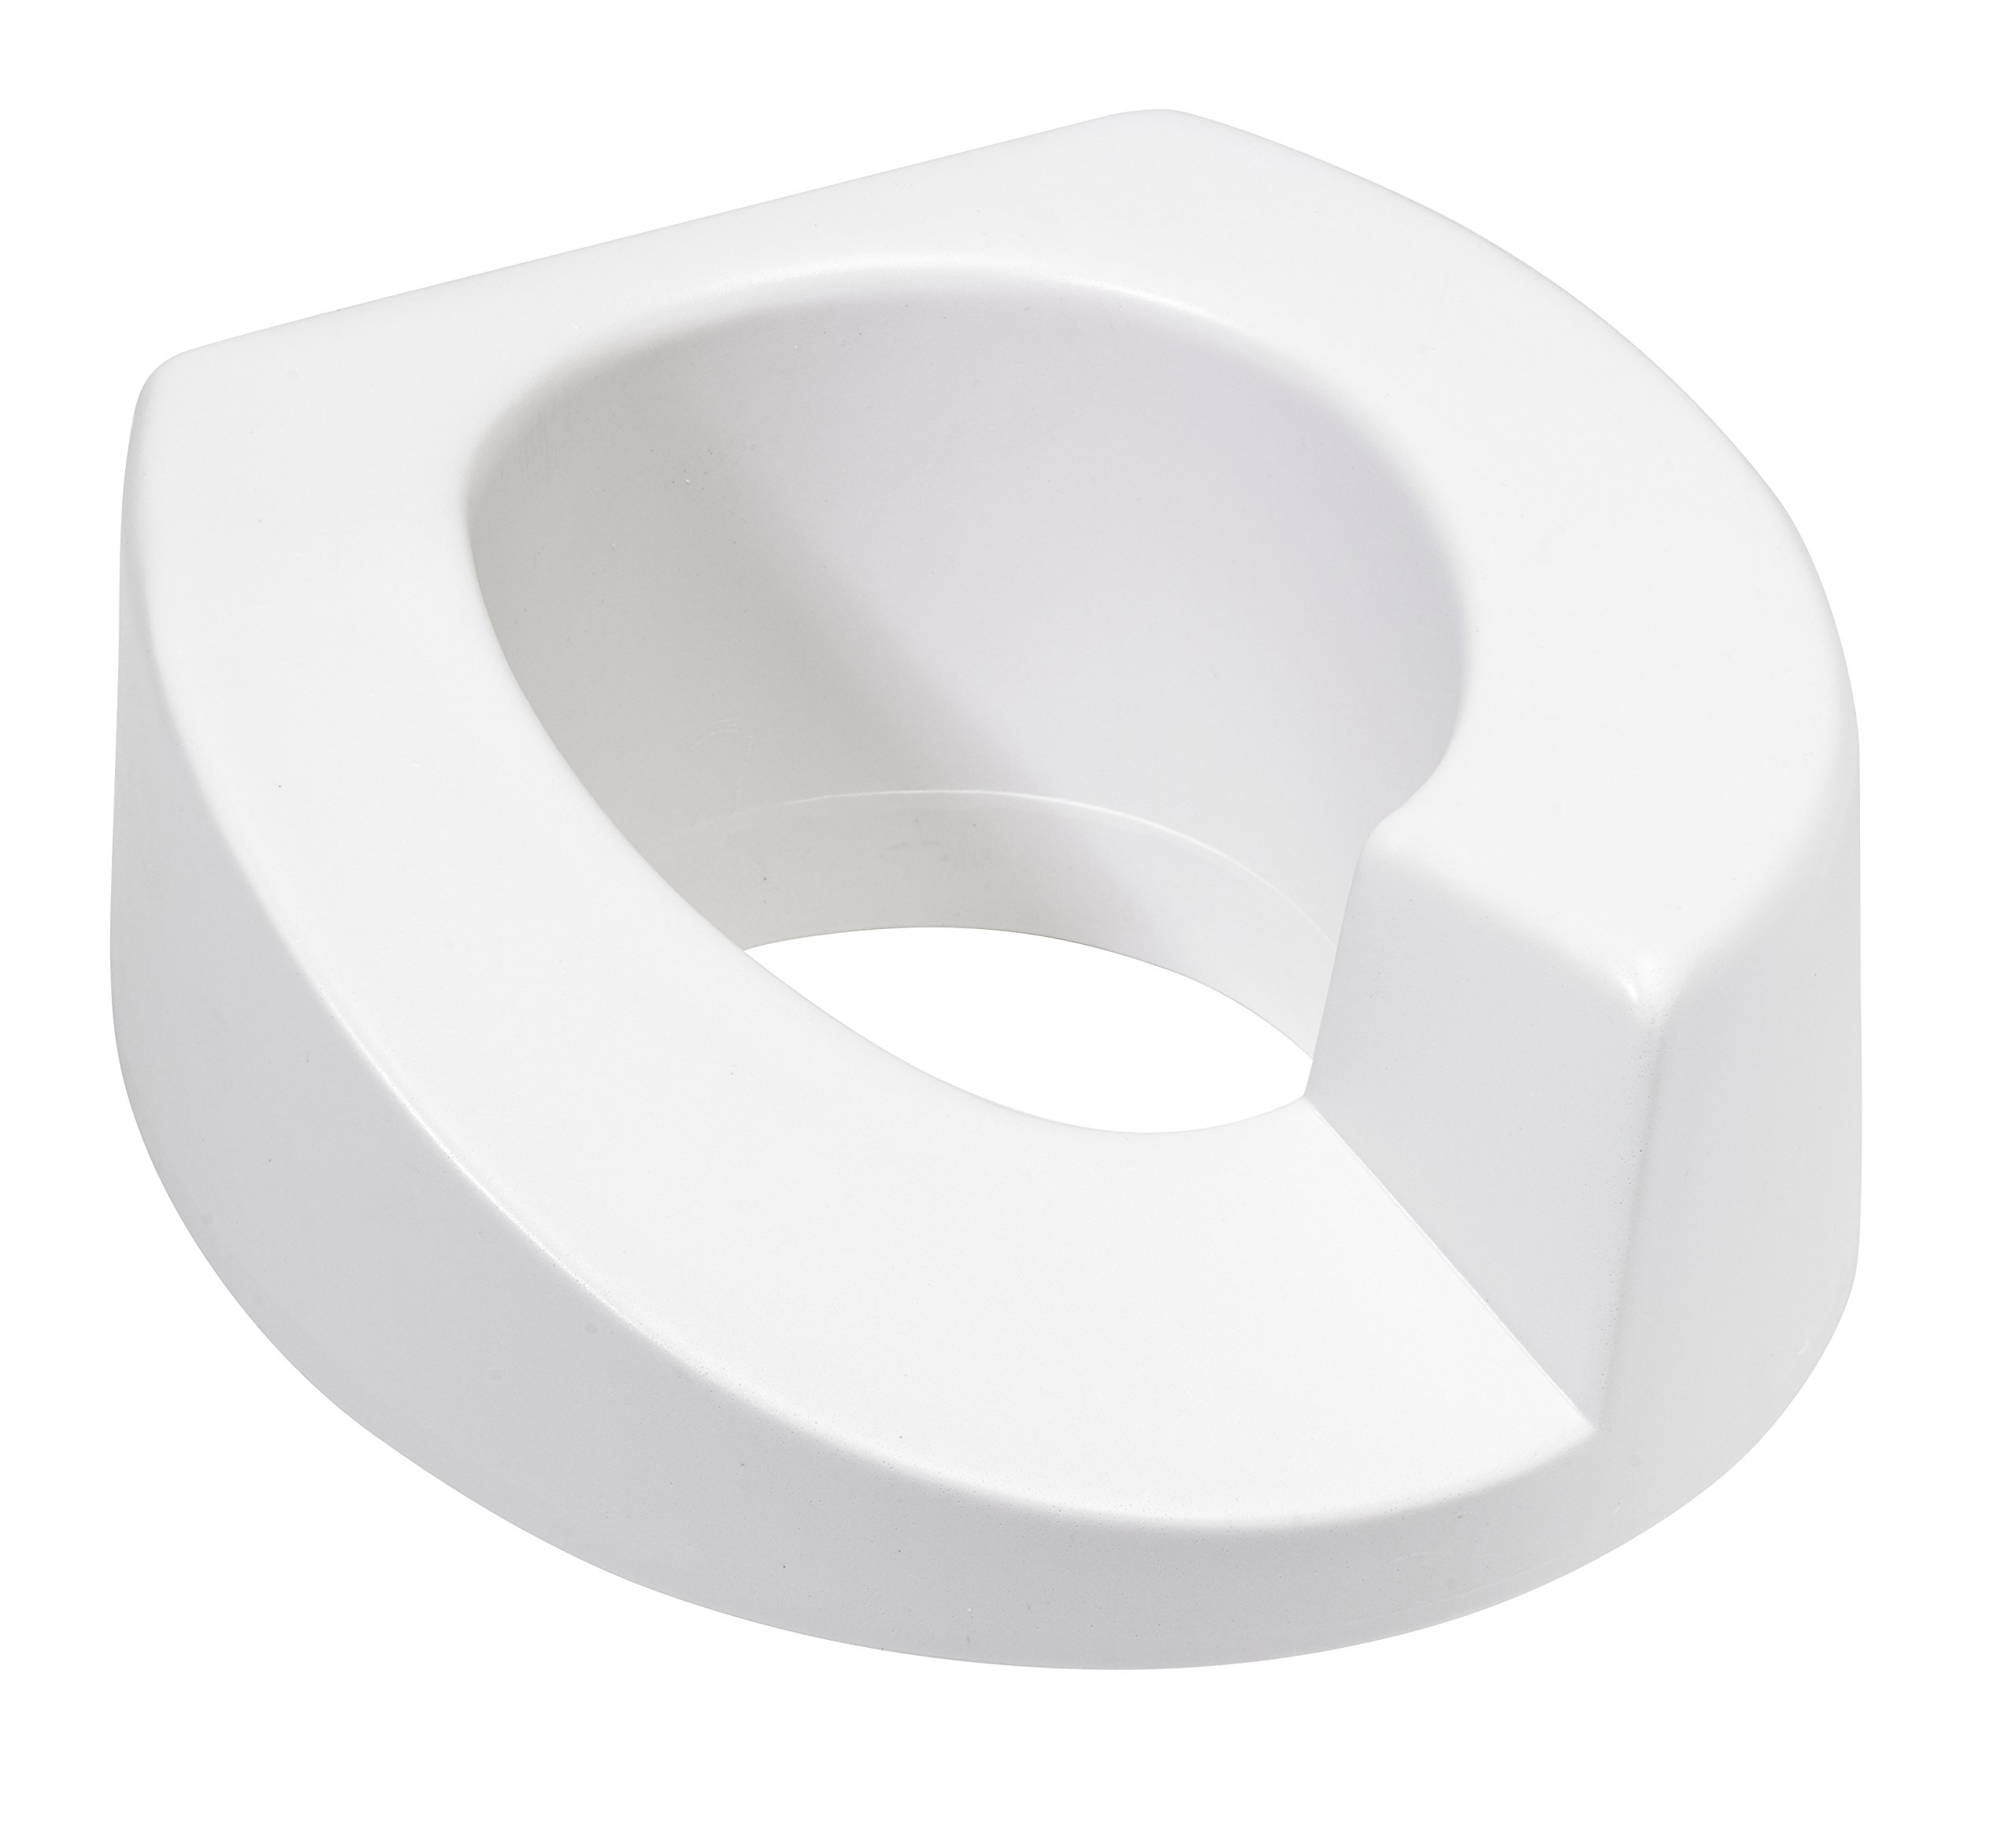 Maddak Elevated Toilet Seat, Right Cutout by Maddak Inc.